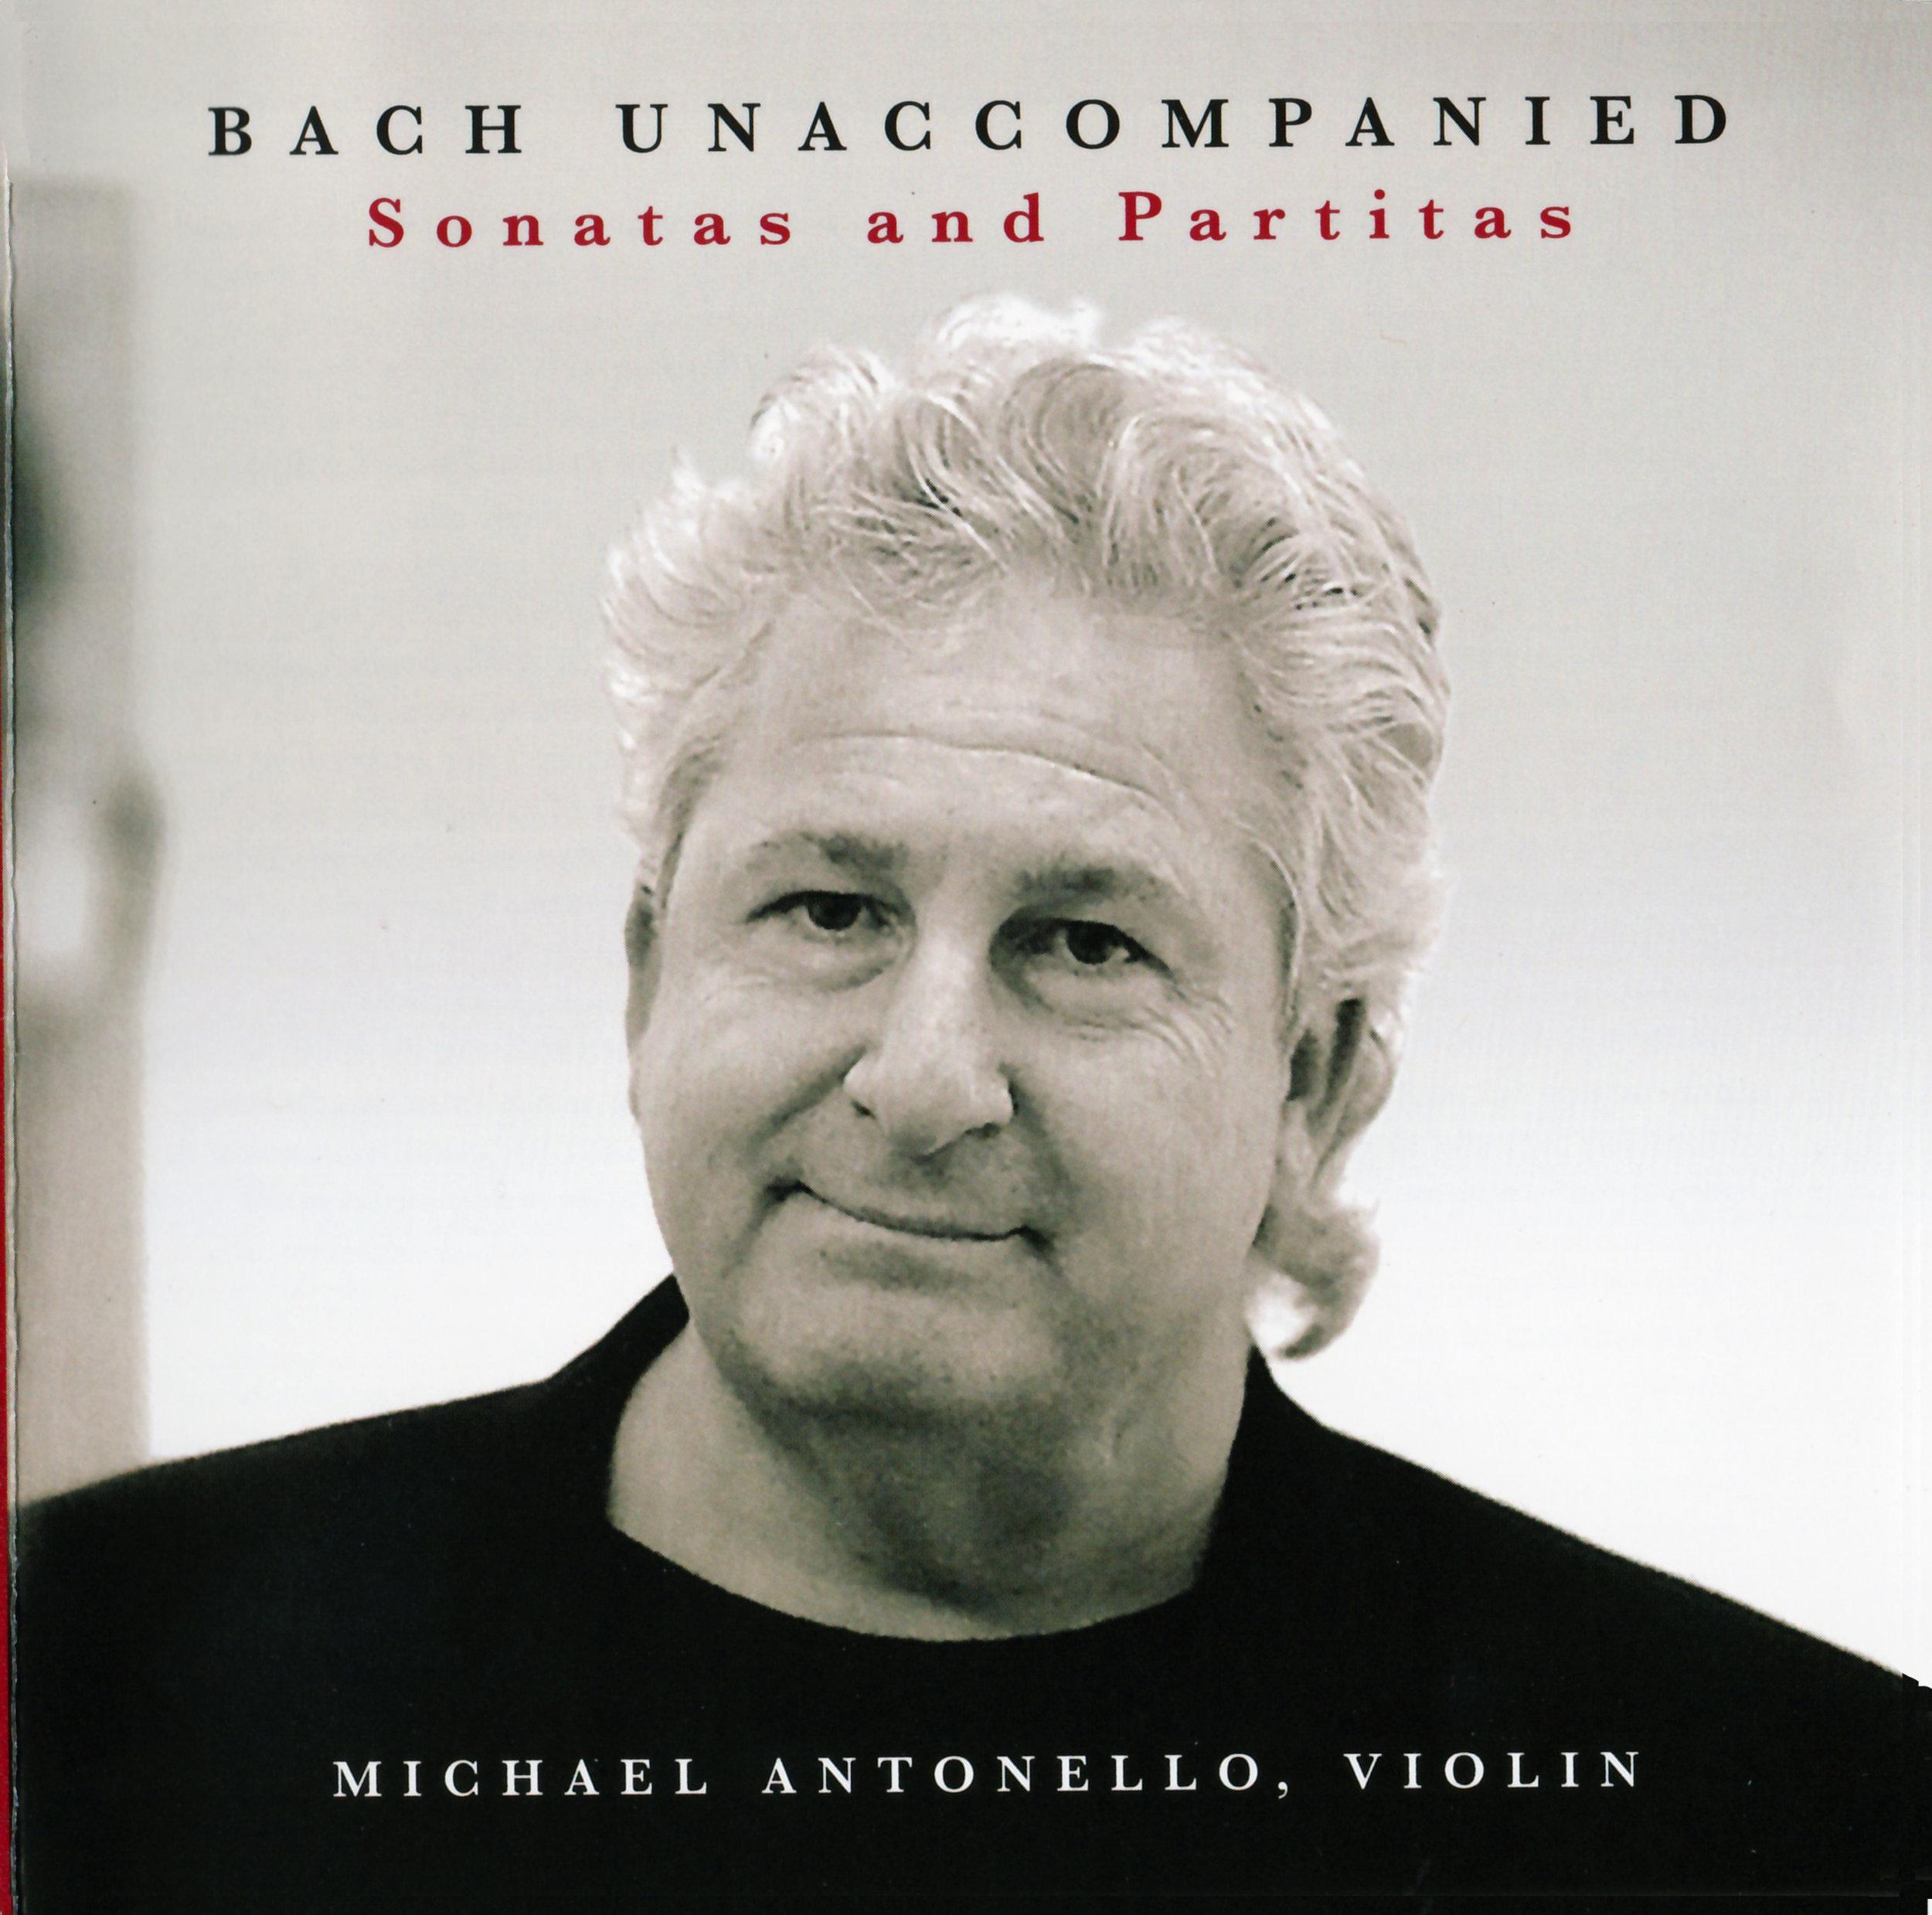 Bach Unaccompanied Sonatas and Partitas